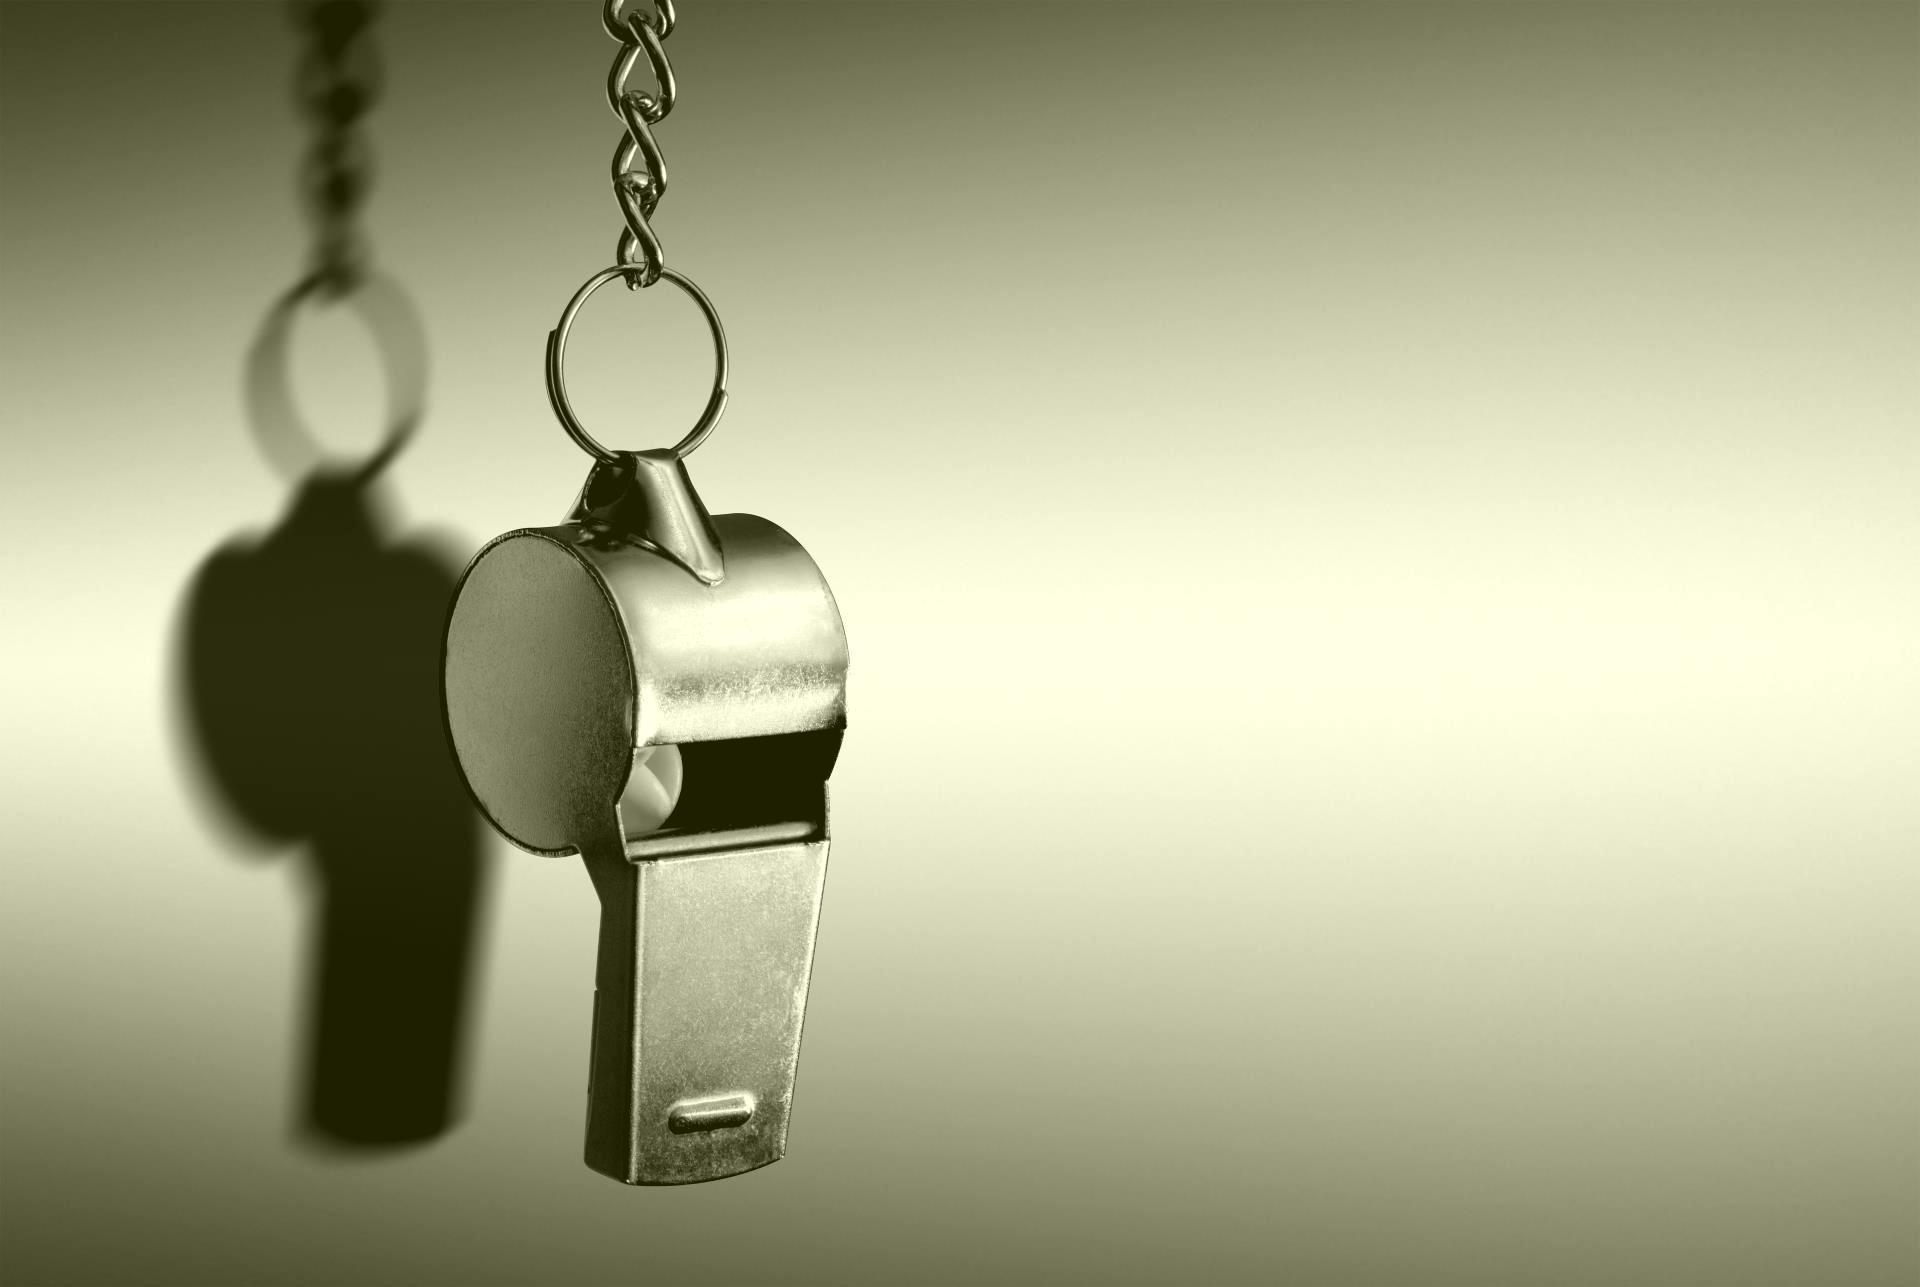 The 3L Whistleblowing Platform